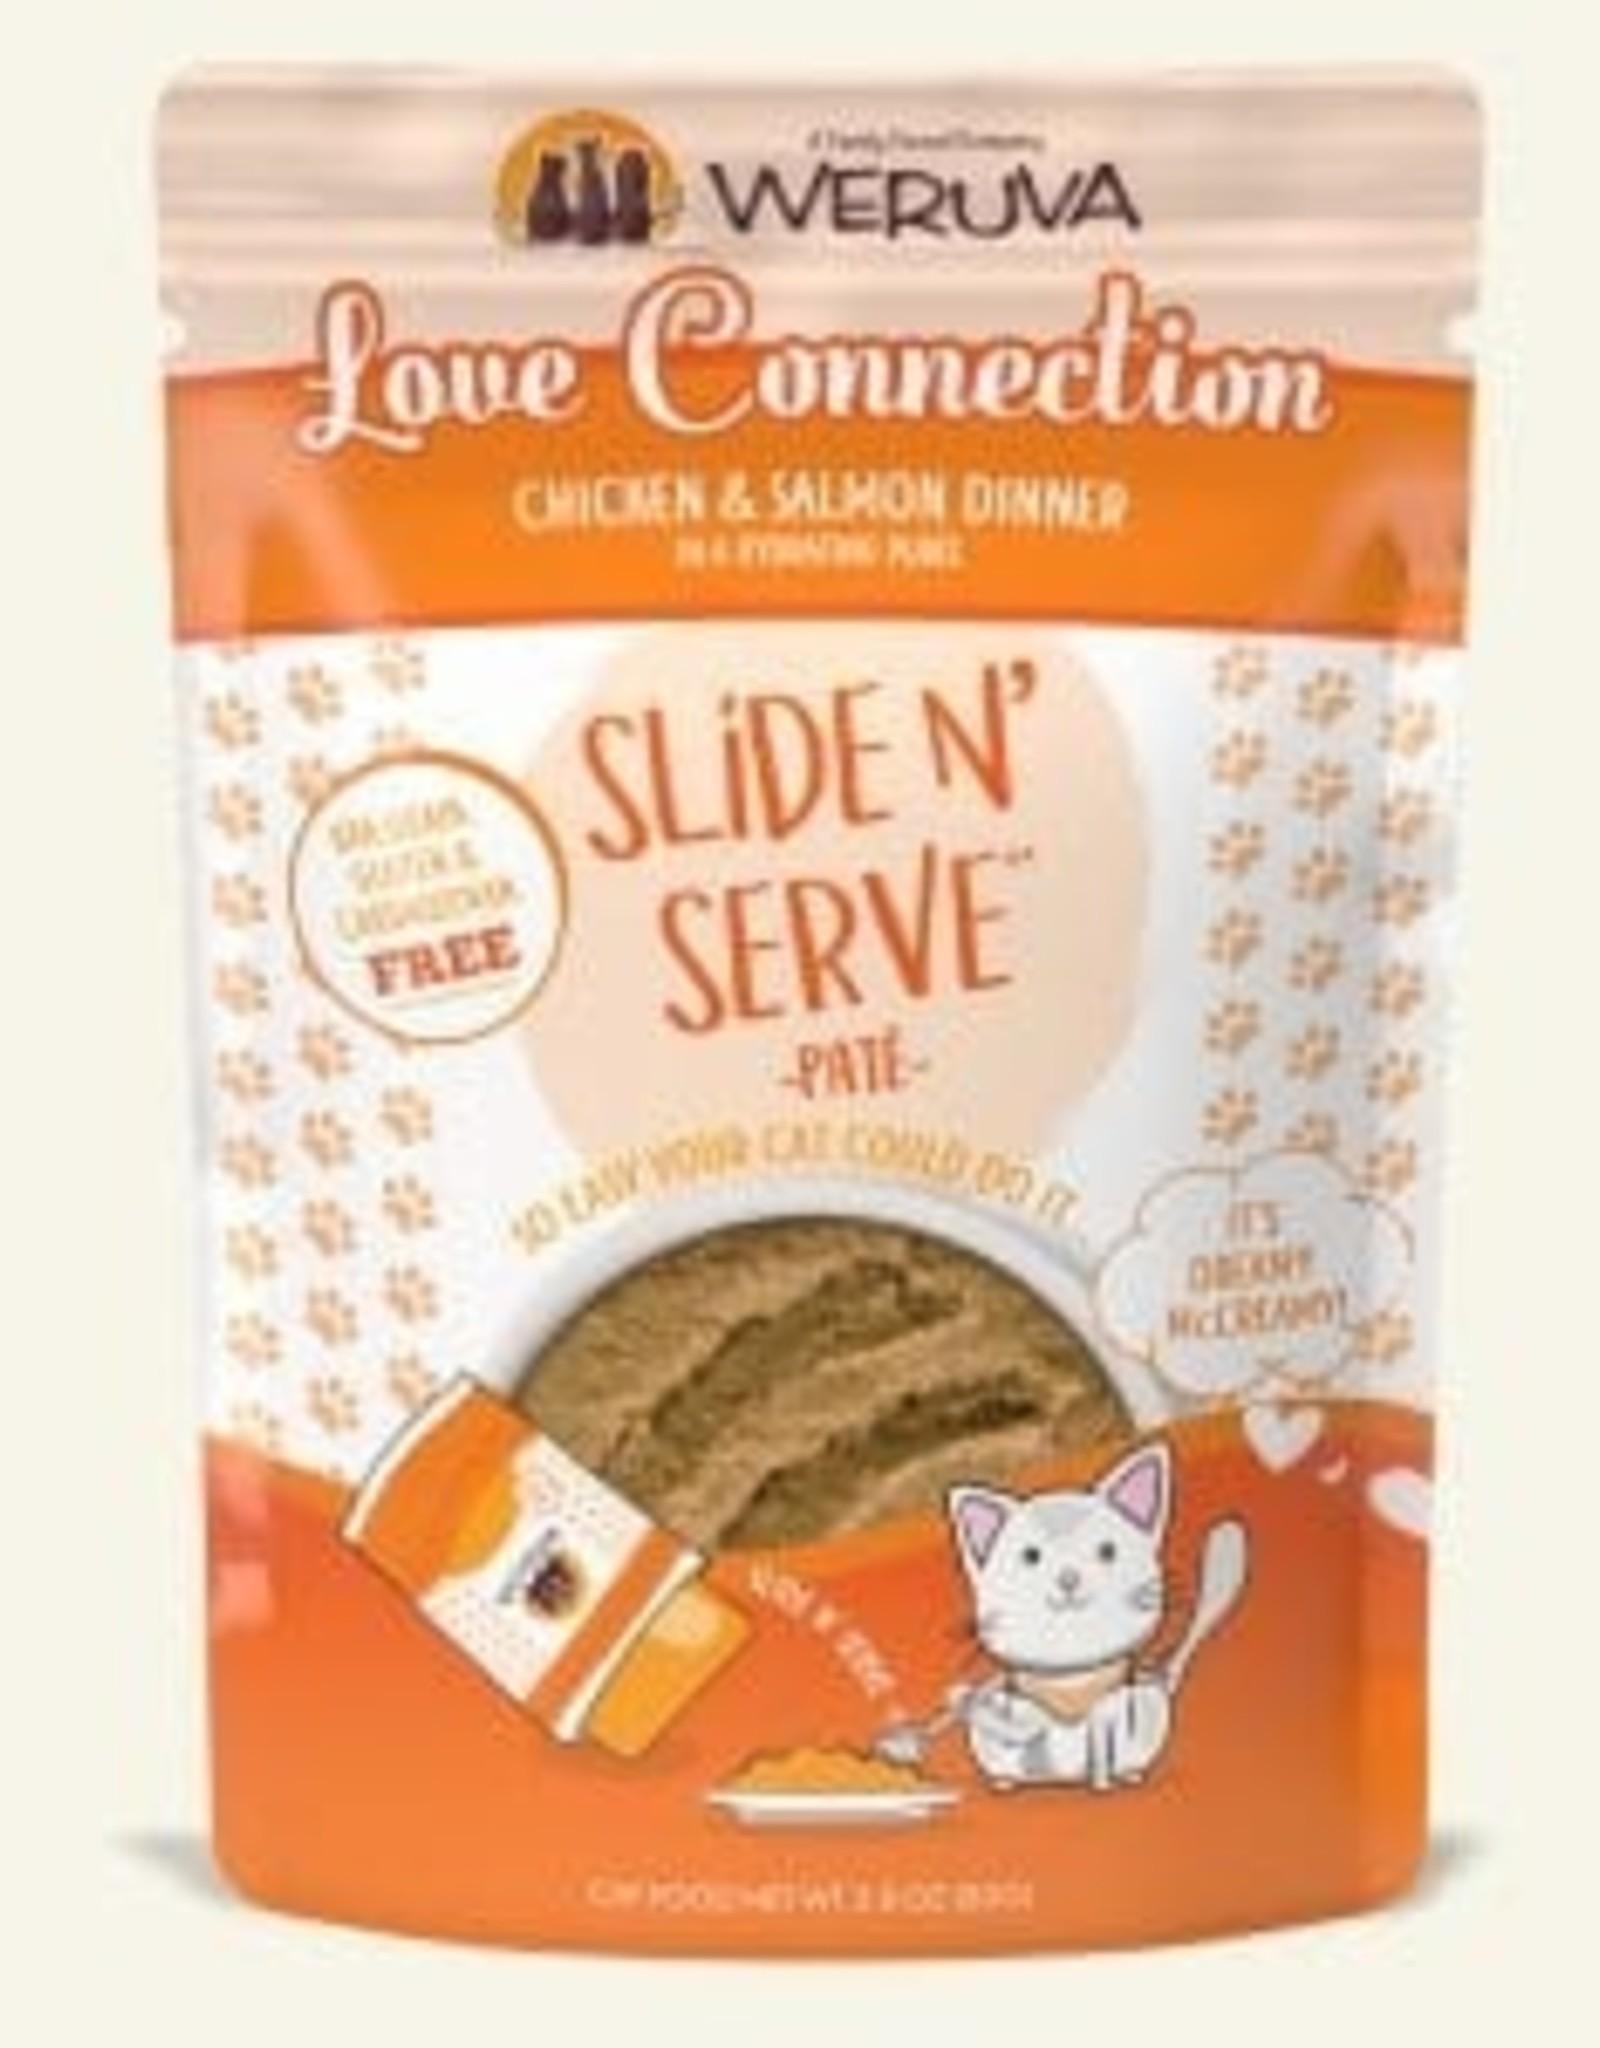 WERUVA Cat SNS Love Connection Pate - Grain-Free 2.8oz